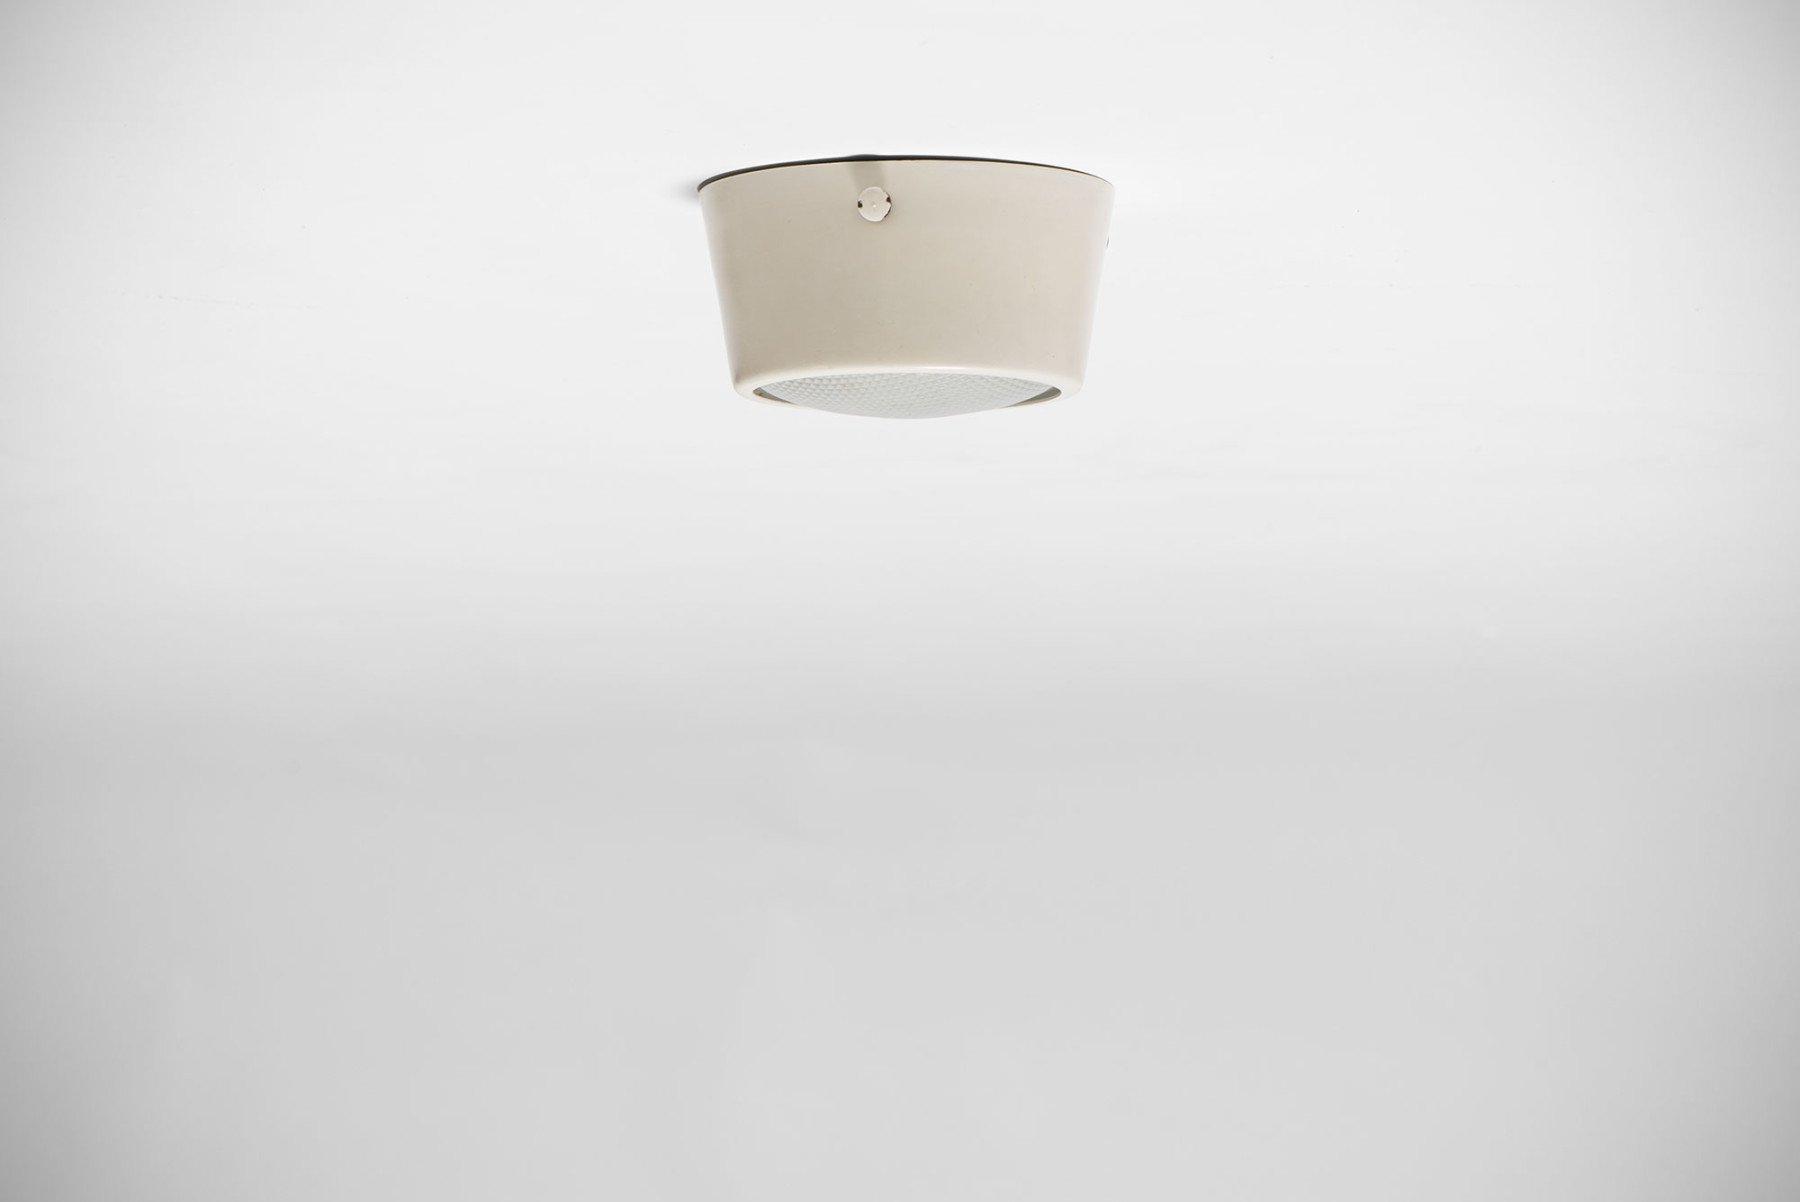 Gino Sarfatti |   Wall or ceiling light, model 3001